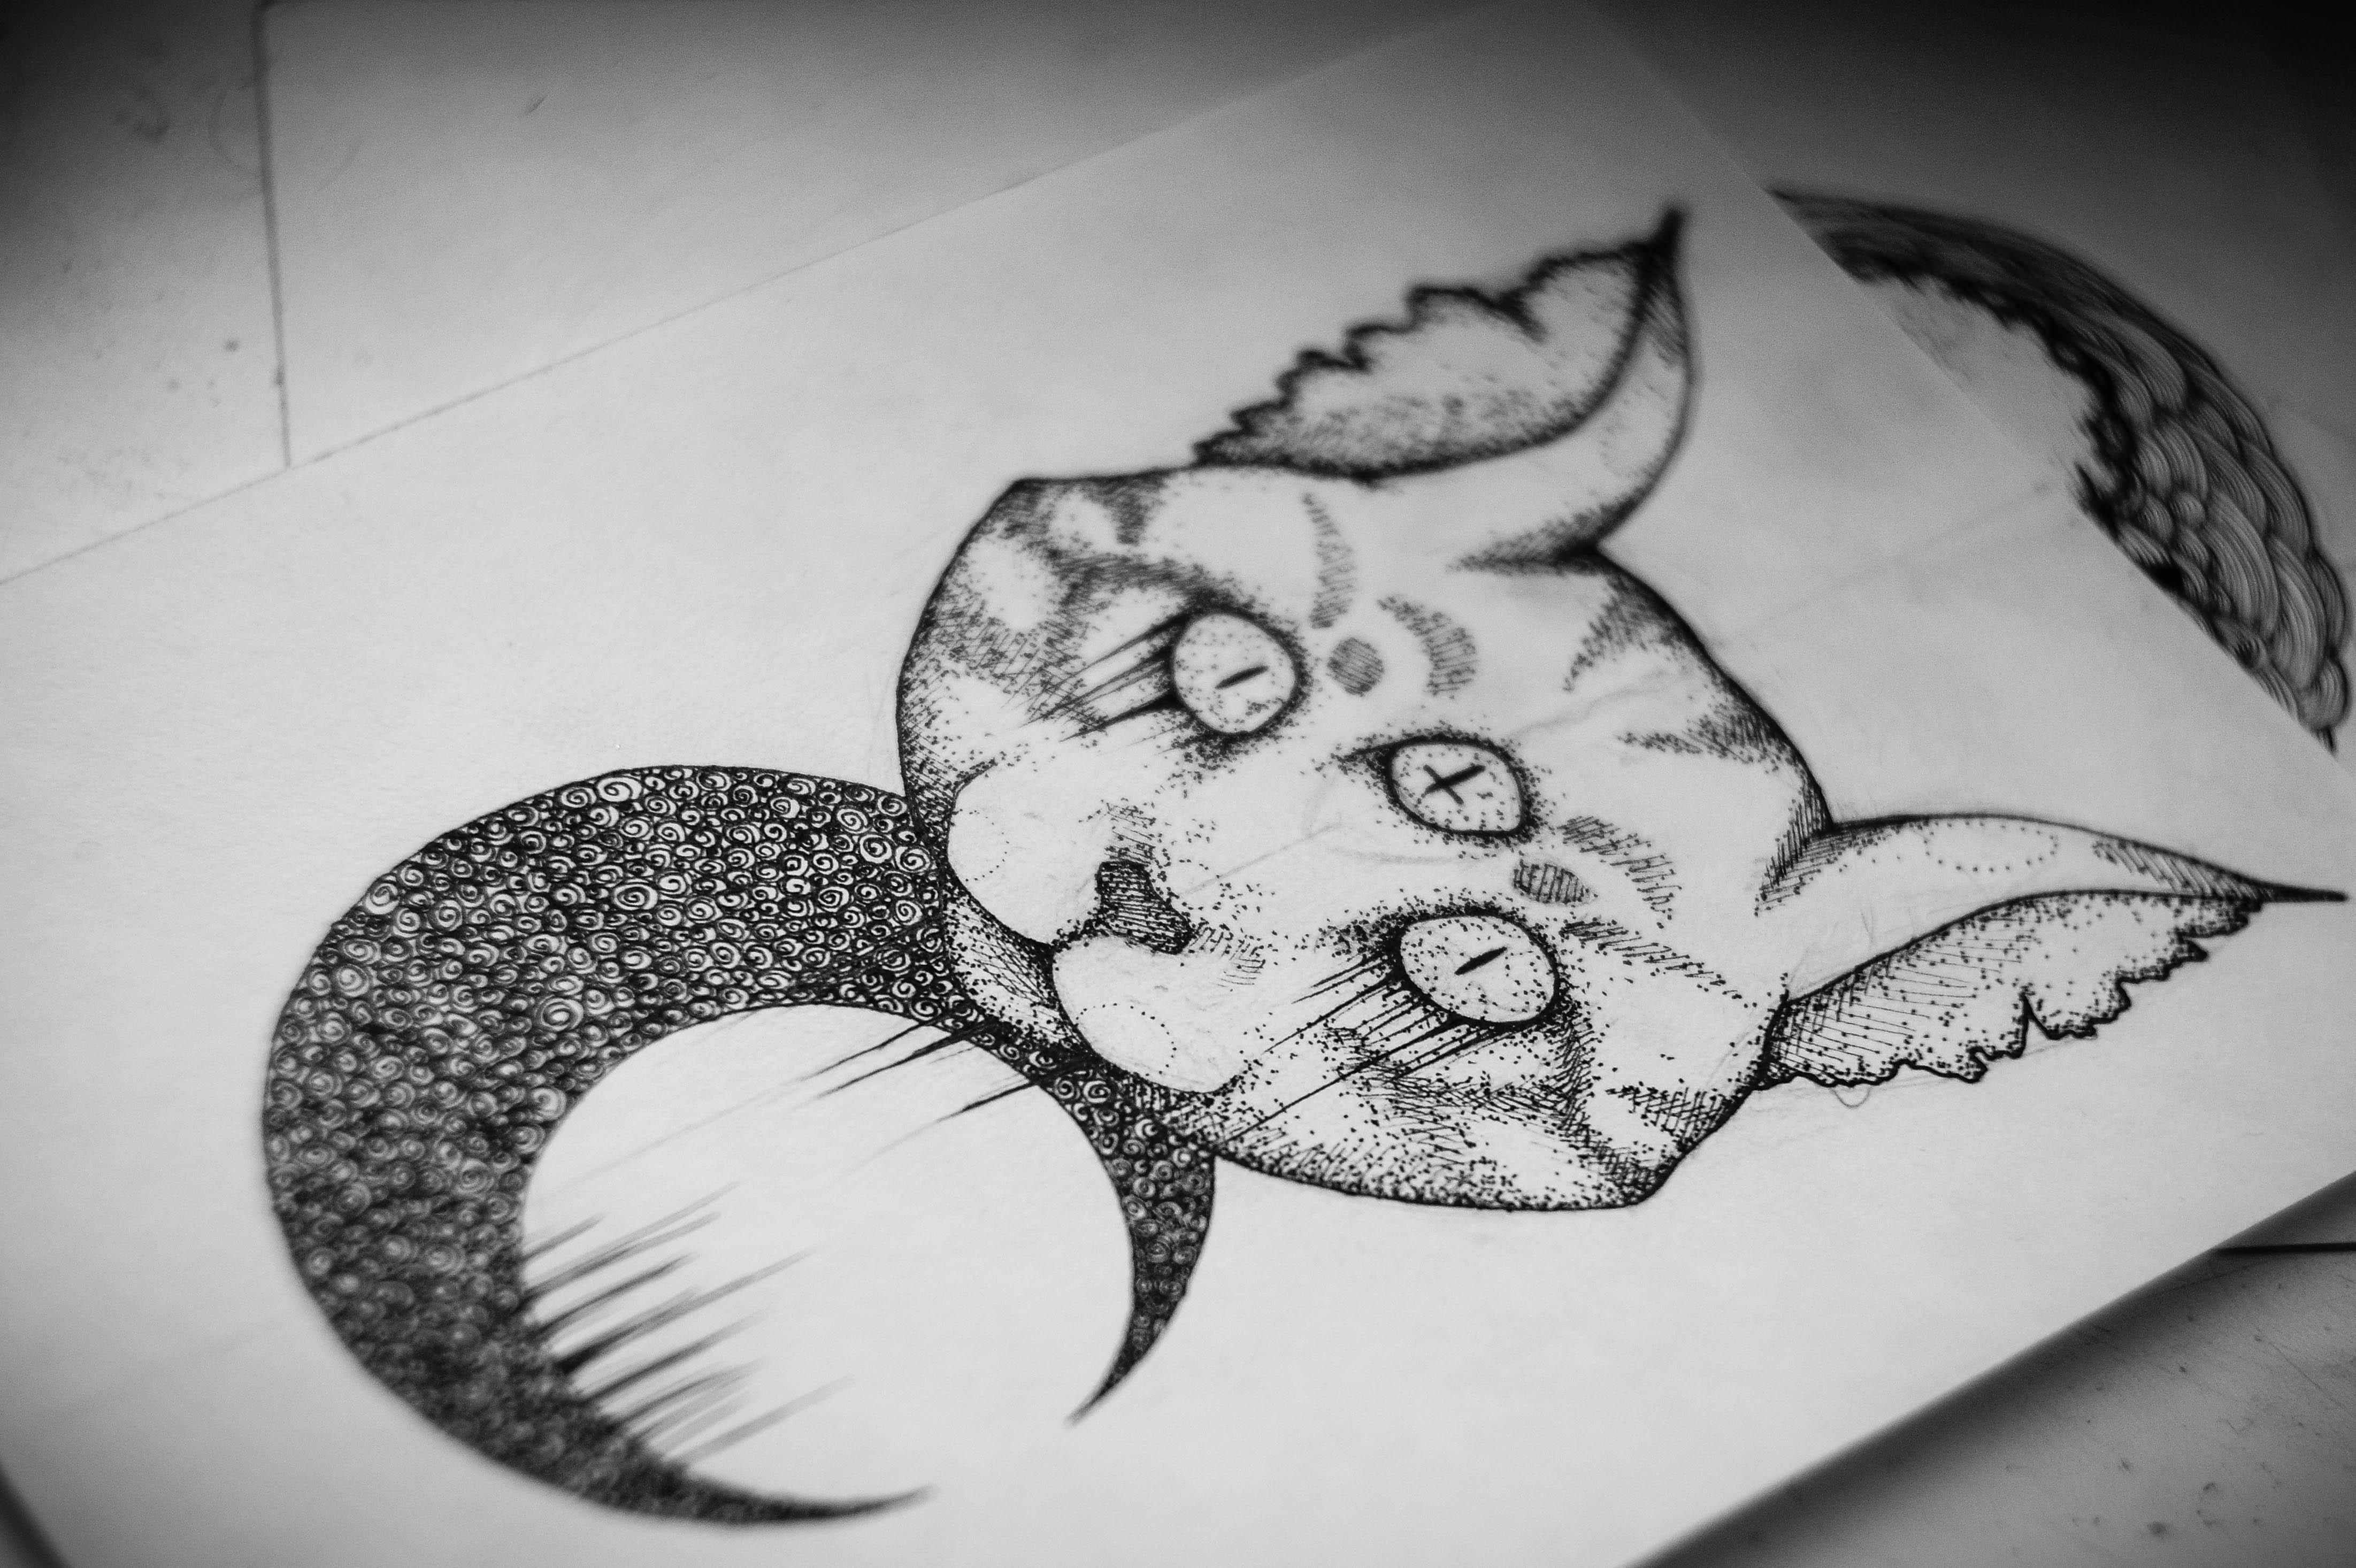 Tattoo art cat satan by askaraya on deviantart for Black and white tattoo artists